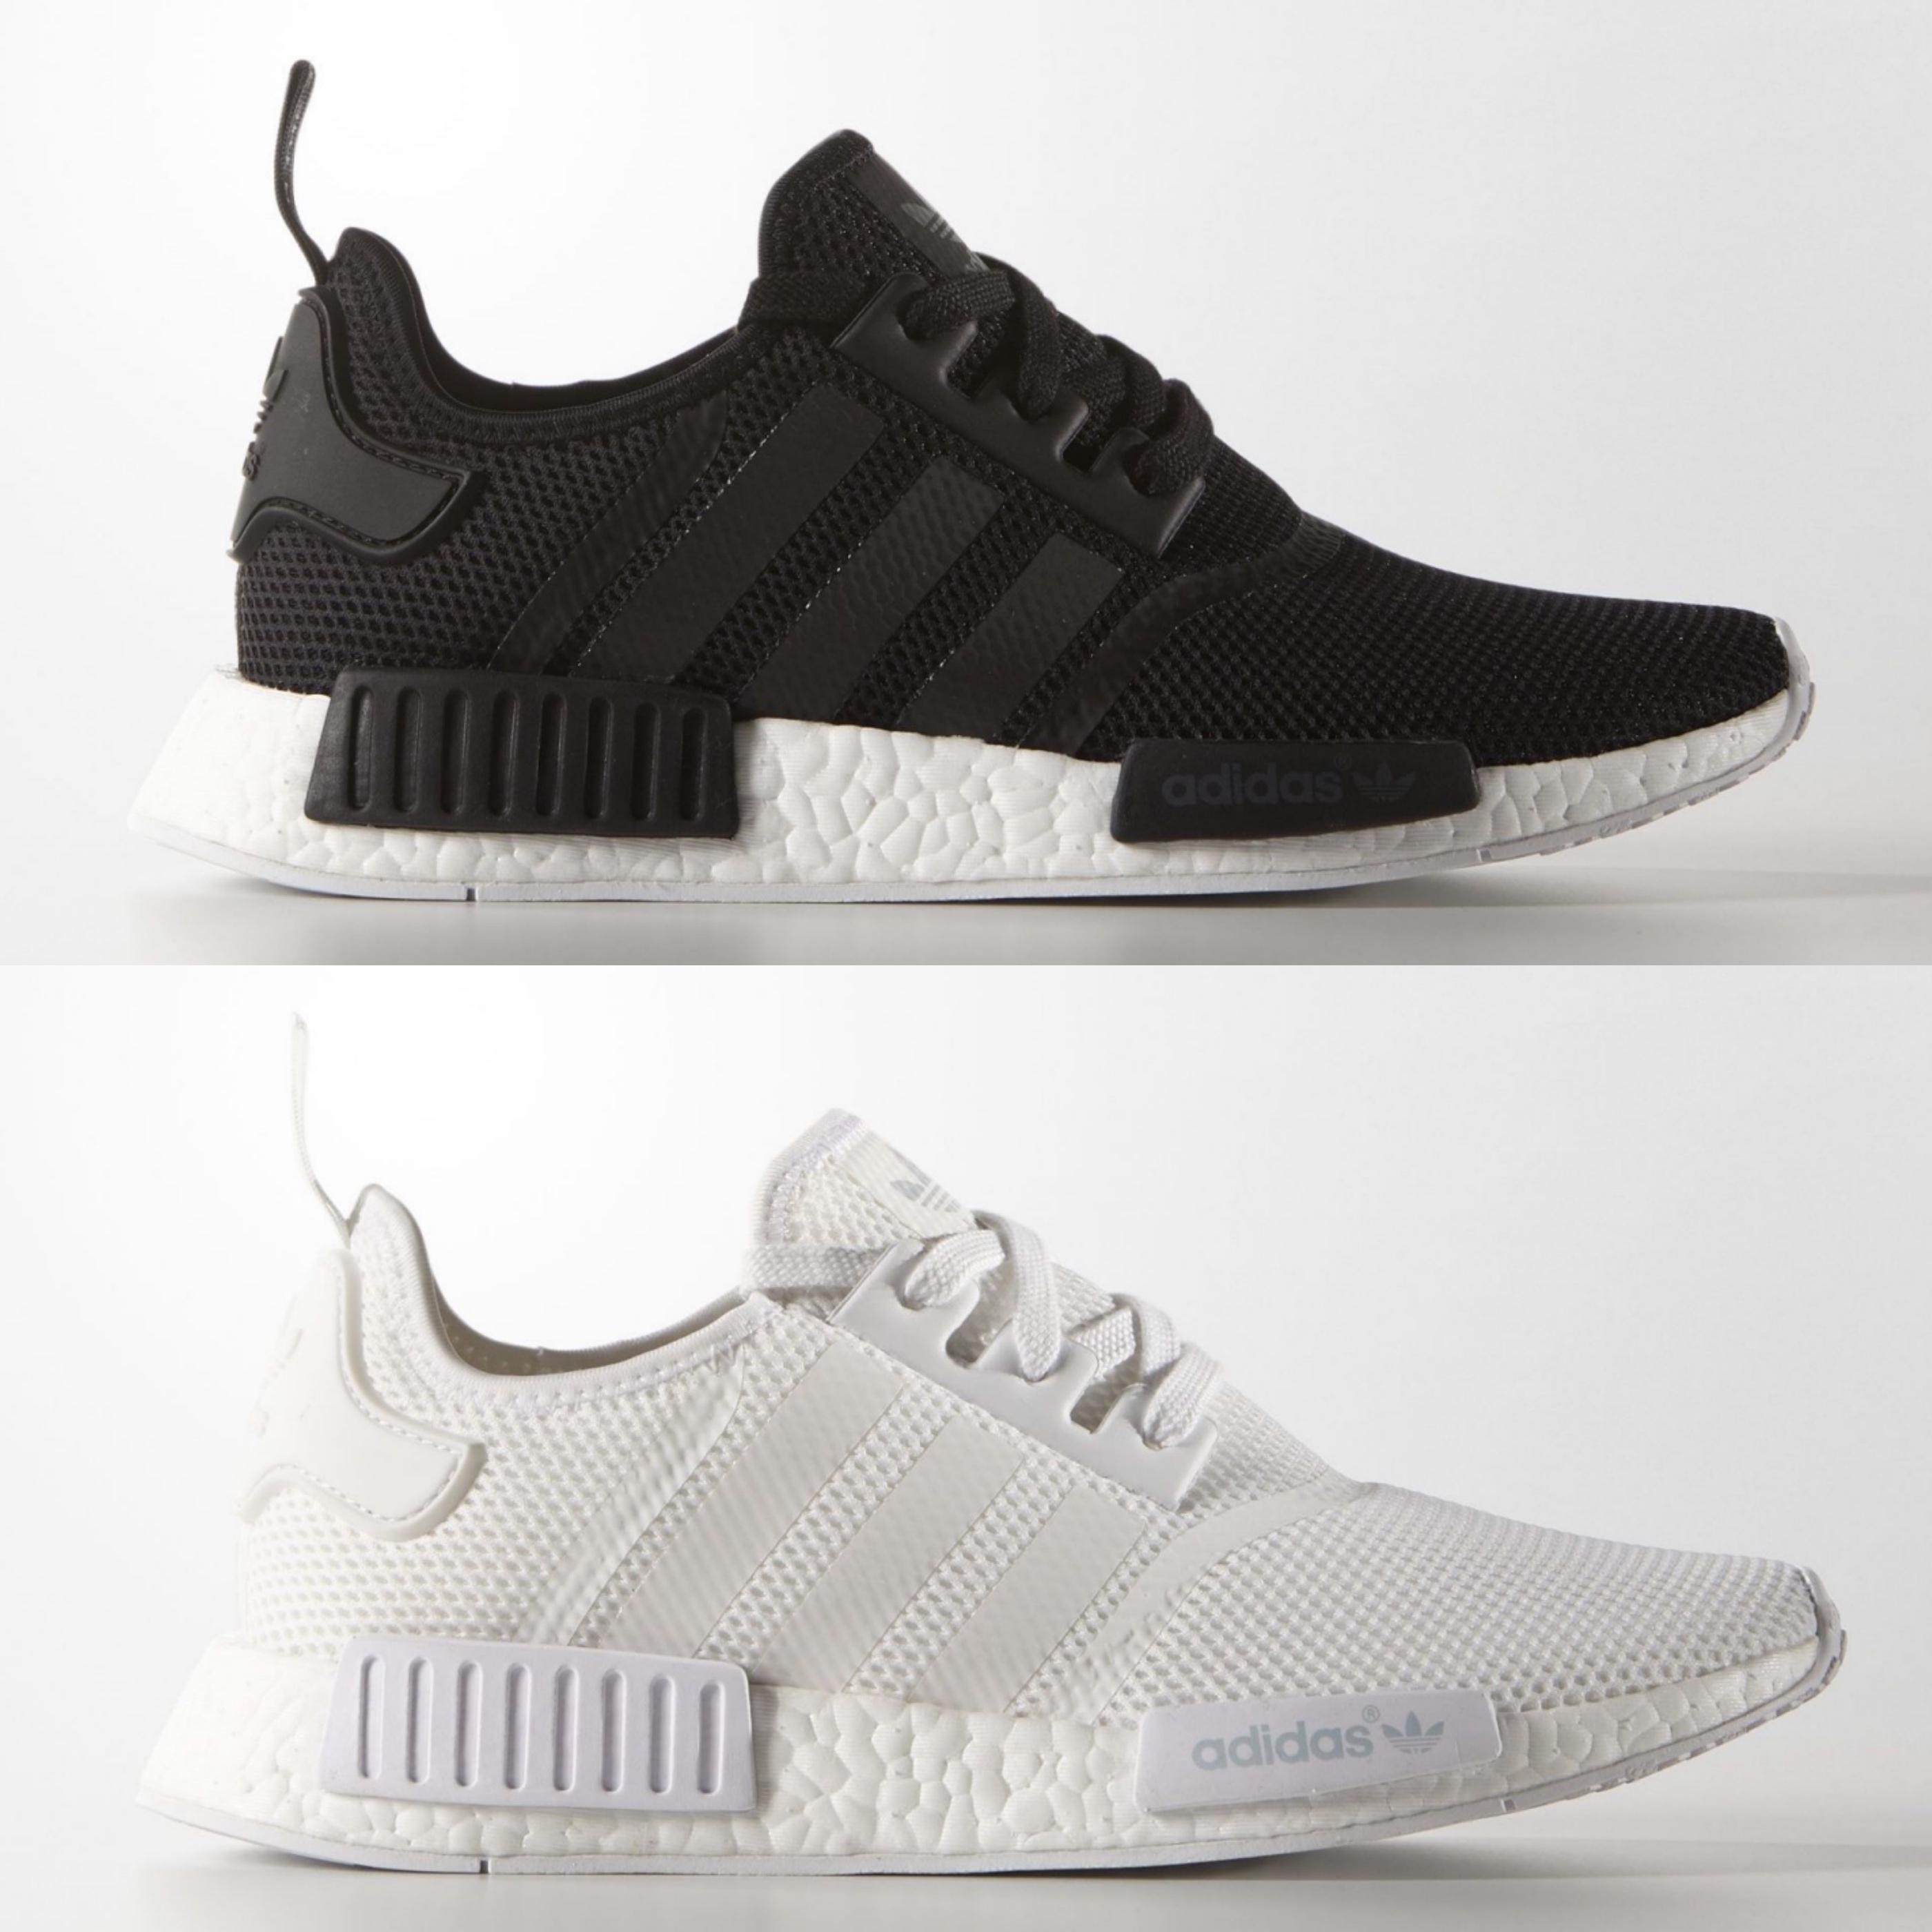 1fbabcc2dbae adidas nmd r1 monochrome black white - WearTesters